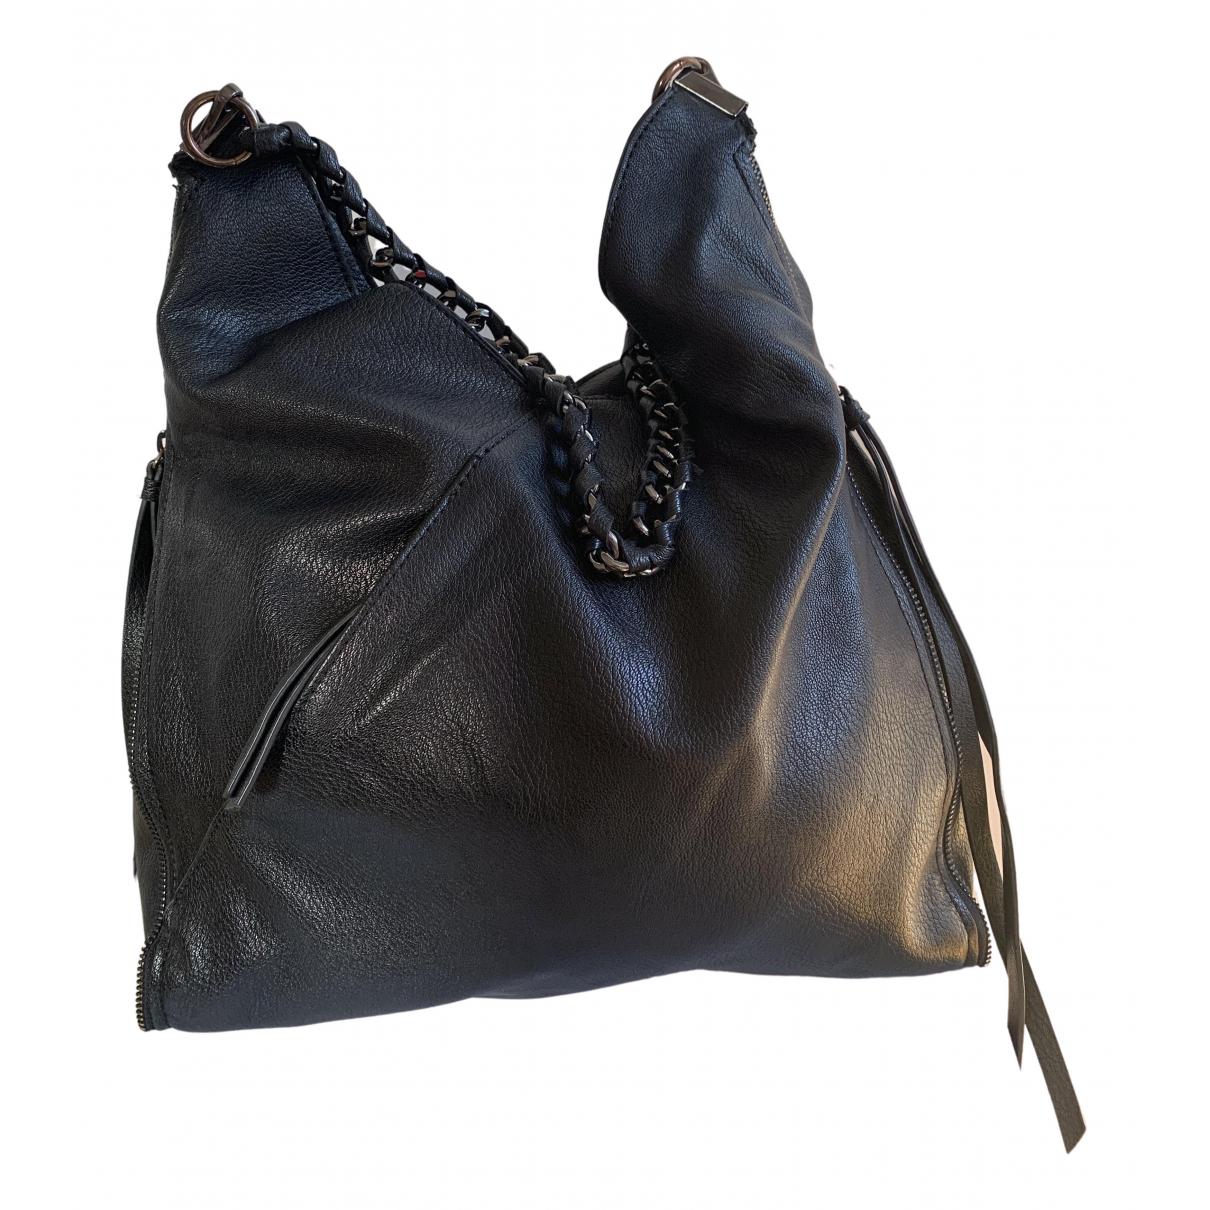 Zara \N Handtasche in  Schwarz Synthetik